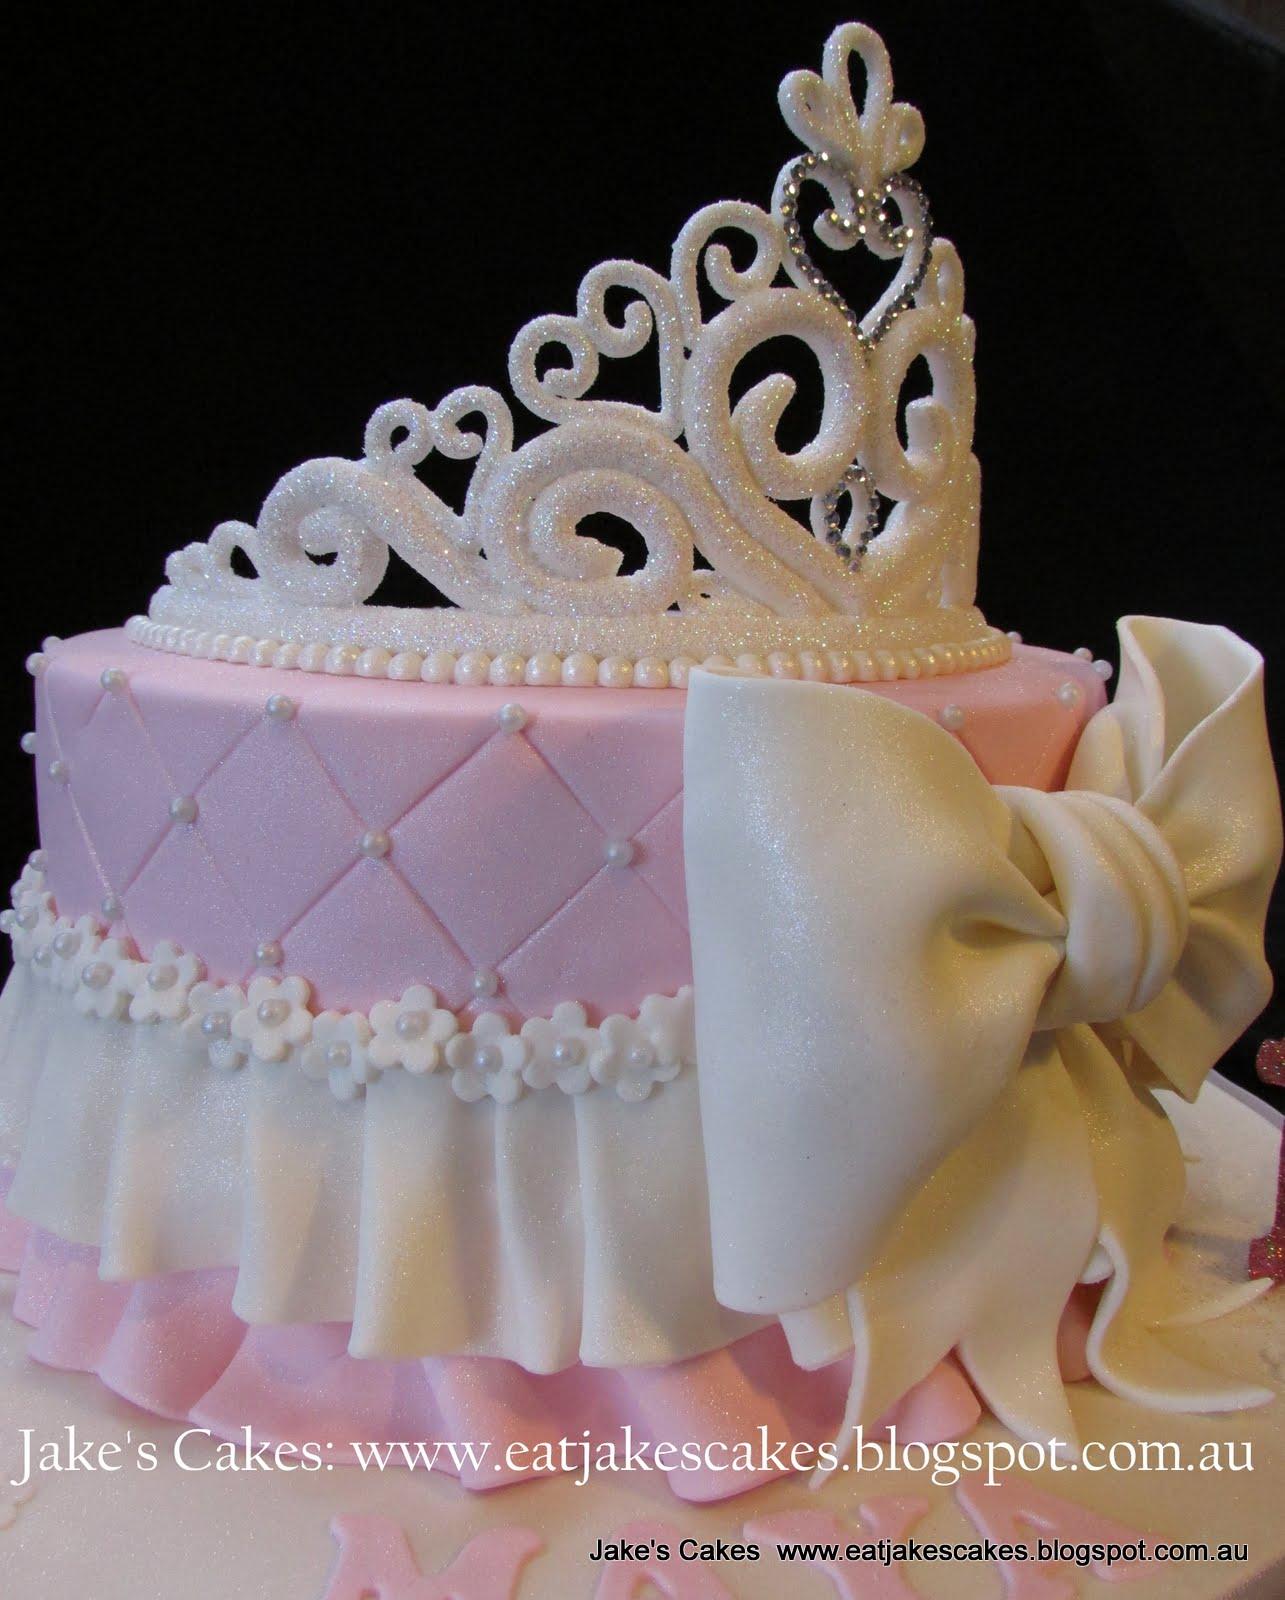 Princess Crown Cake Images : Jake s Cakes: Princess Tiara Cake